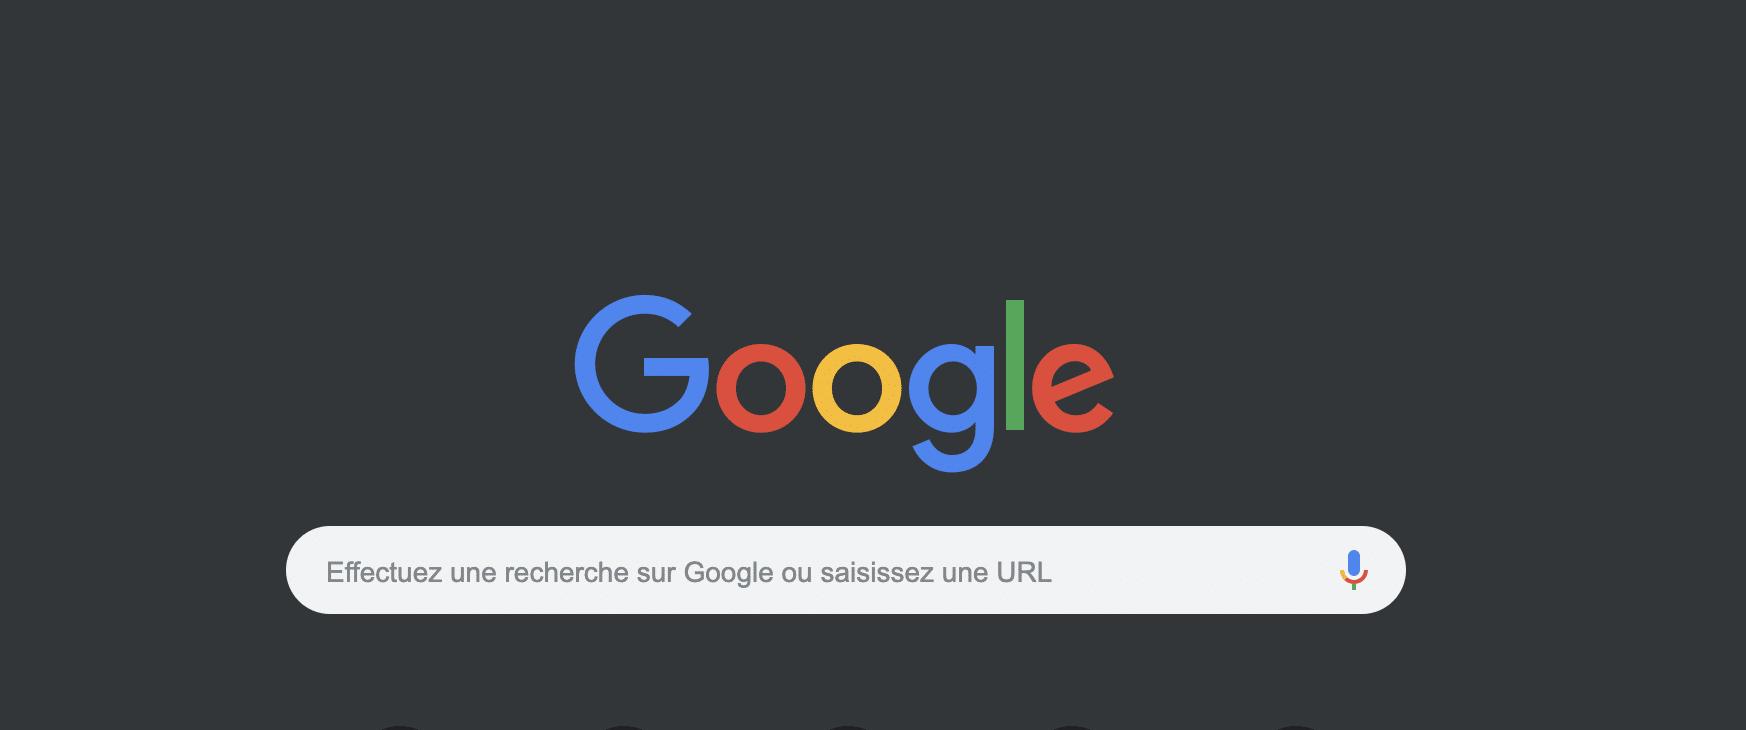 Capture d'écran Google Chrome dark mode